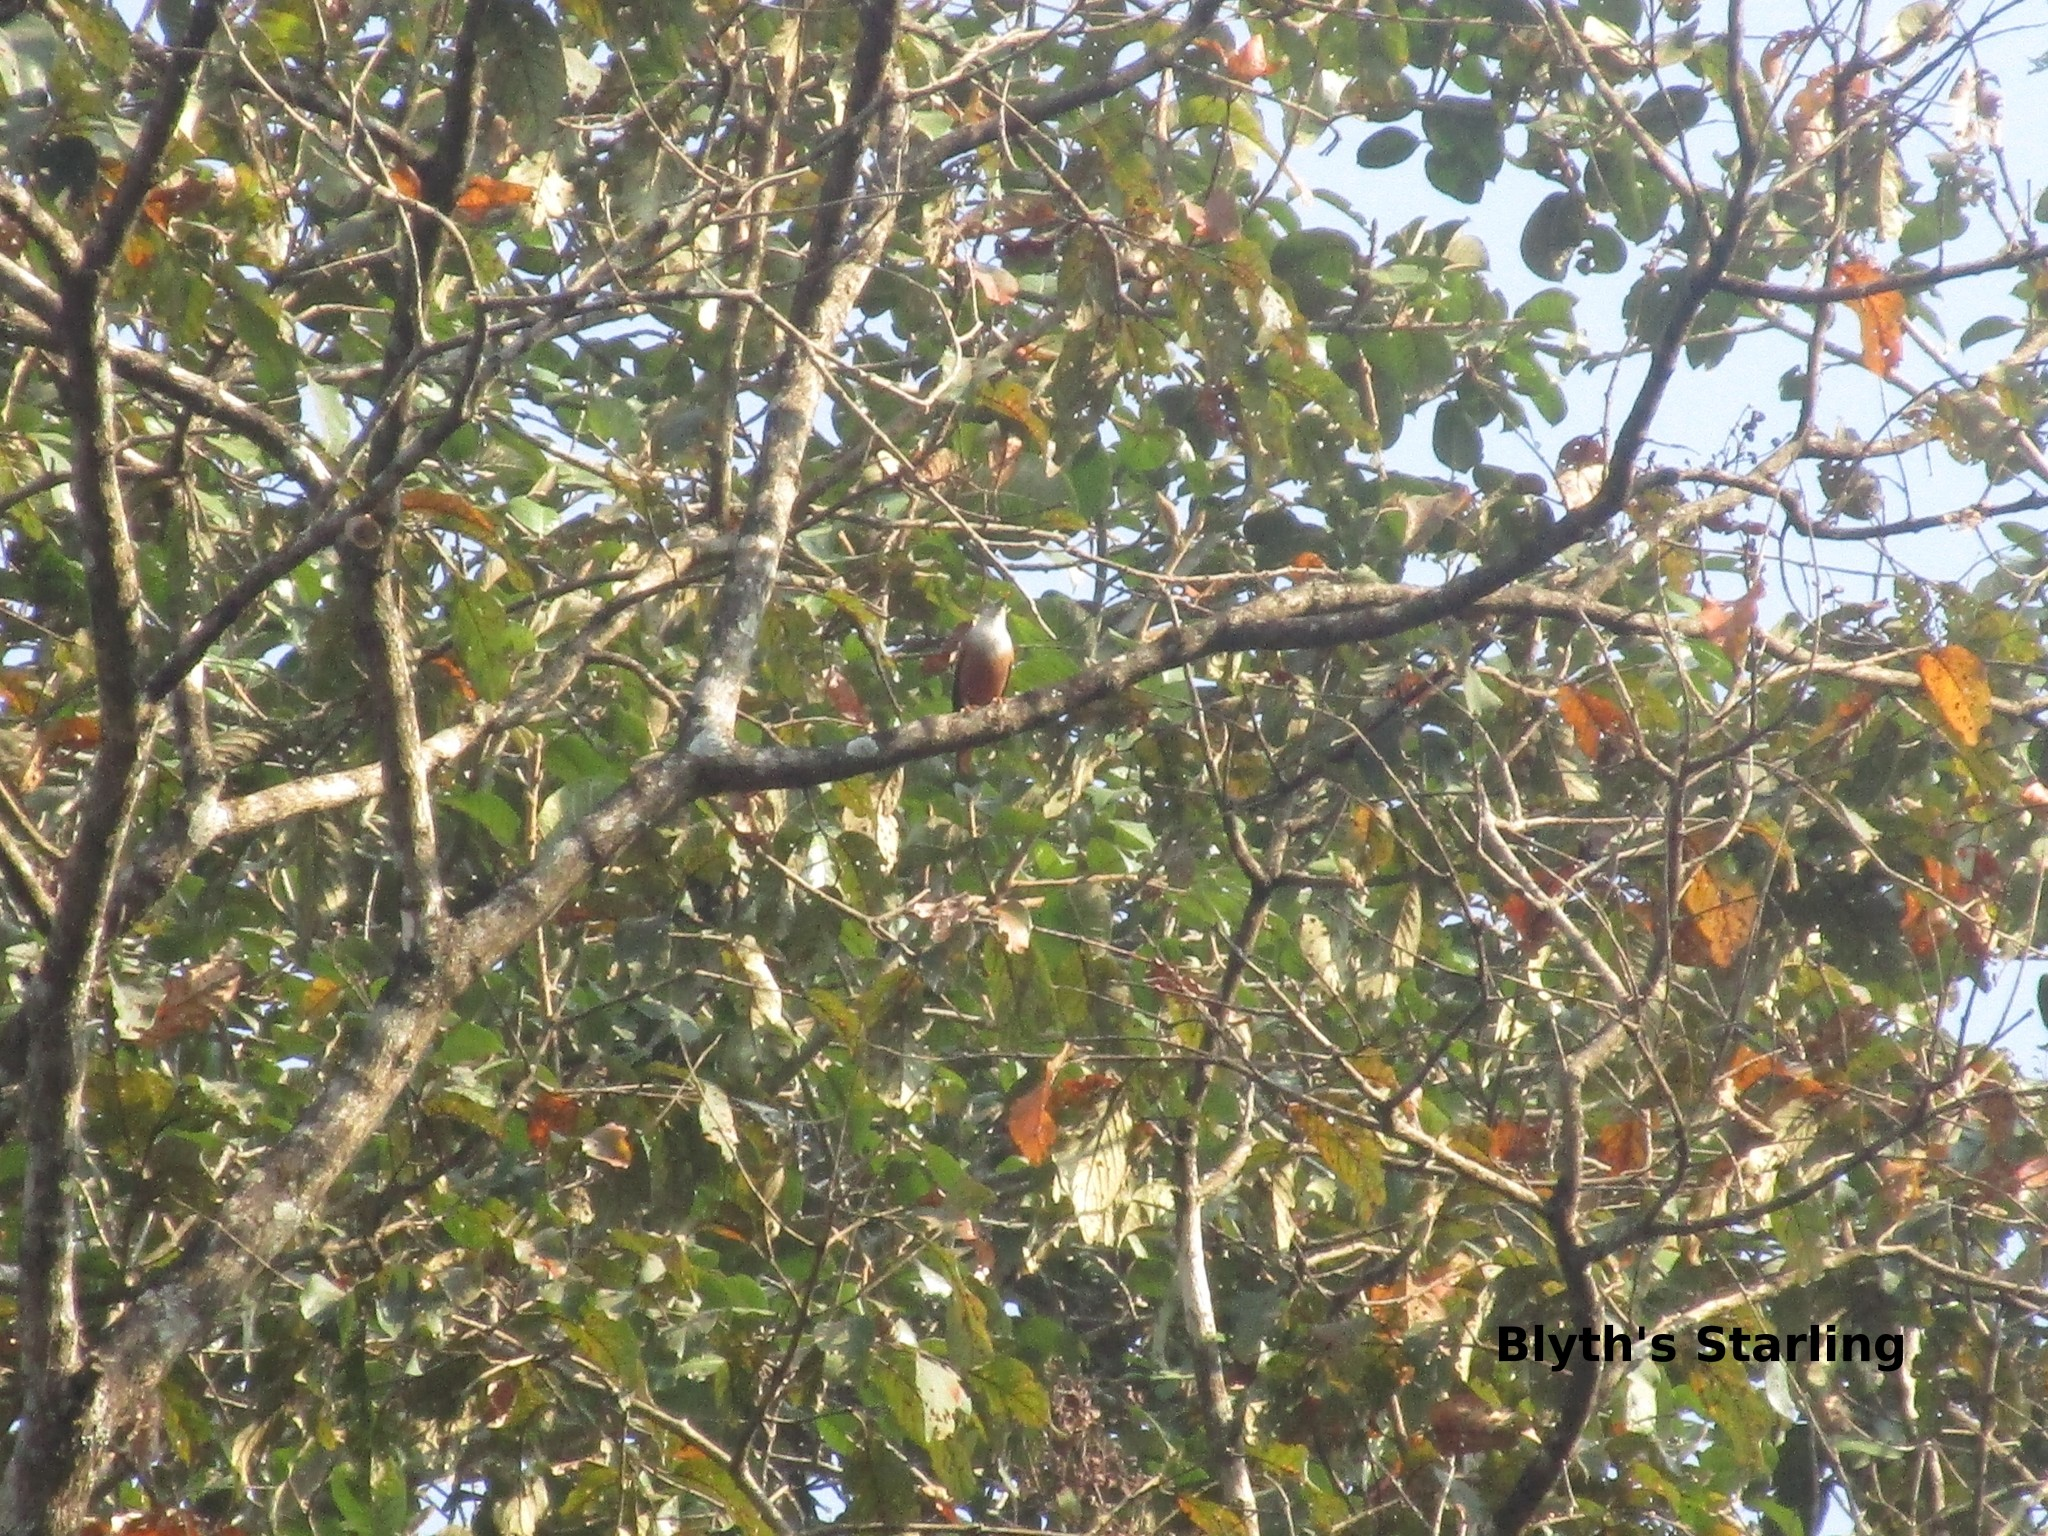 b. starling